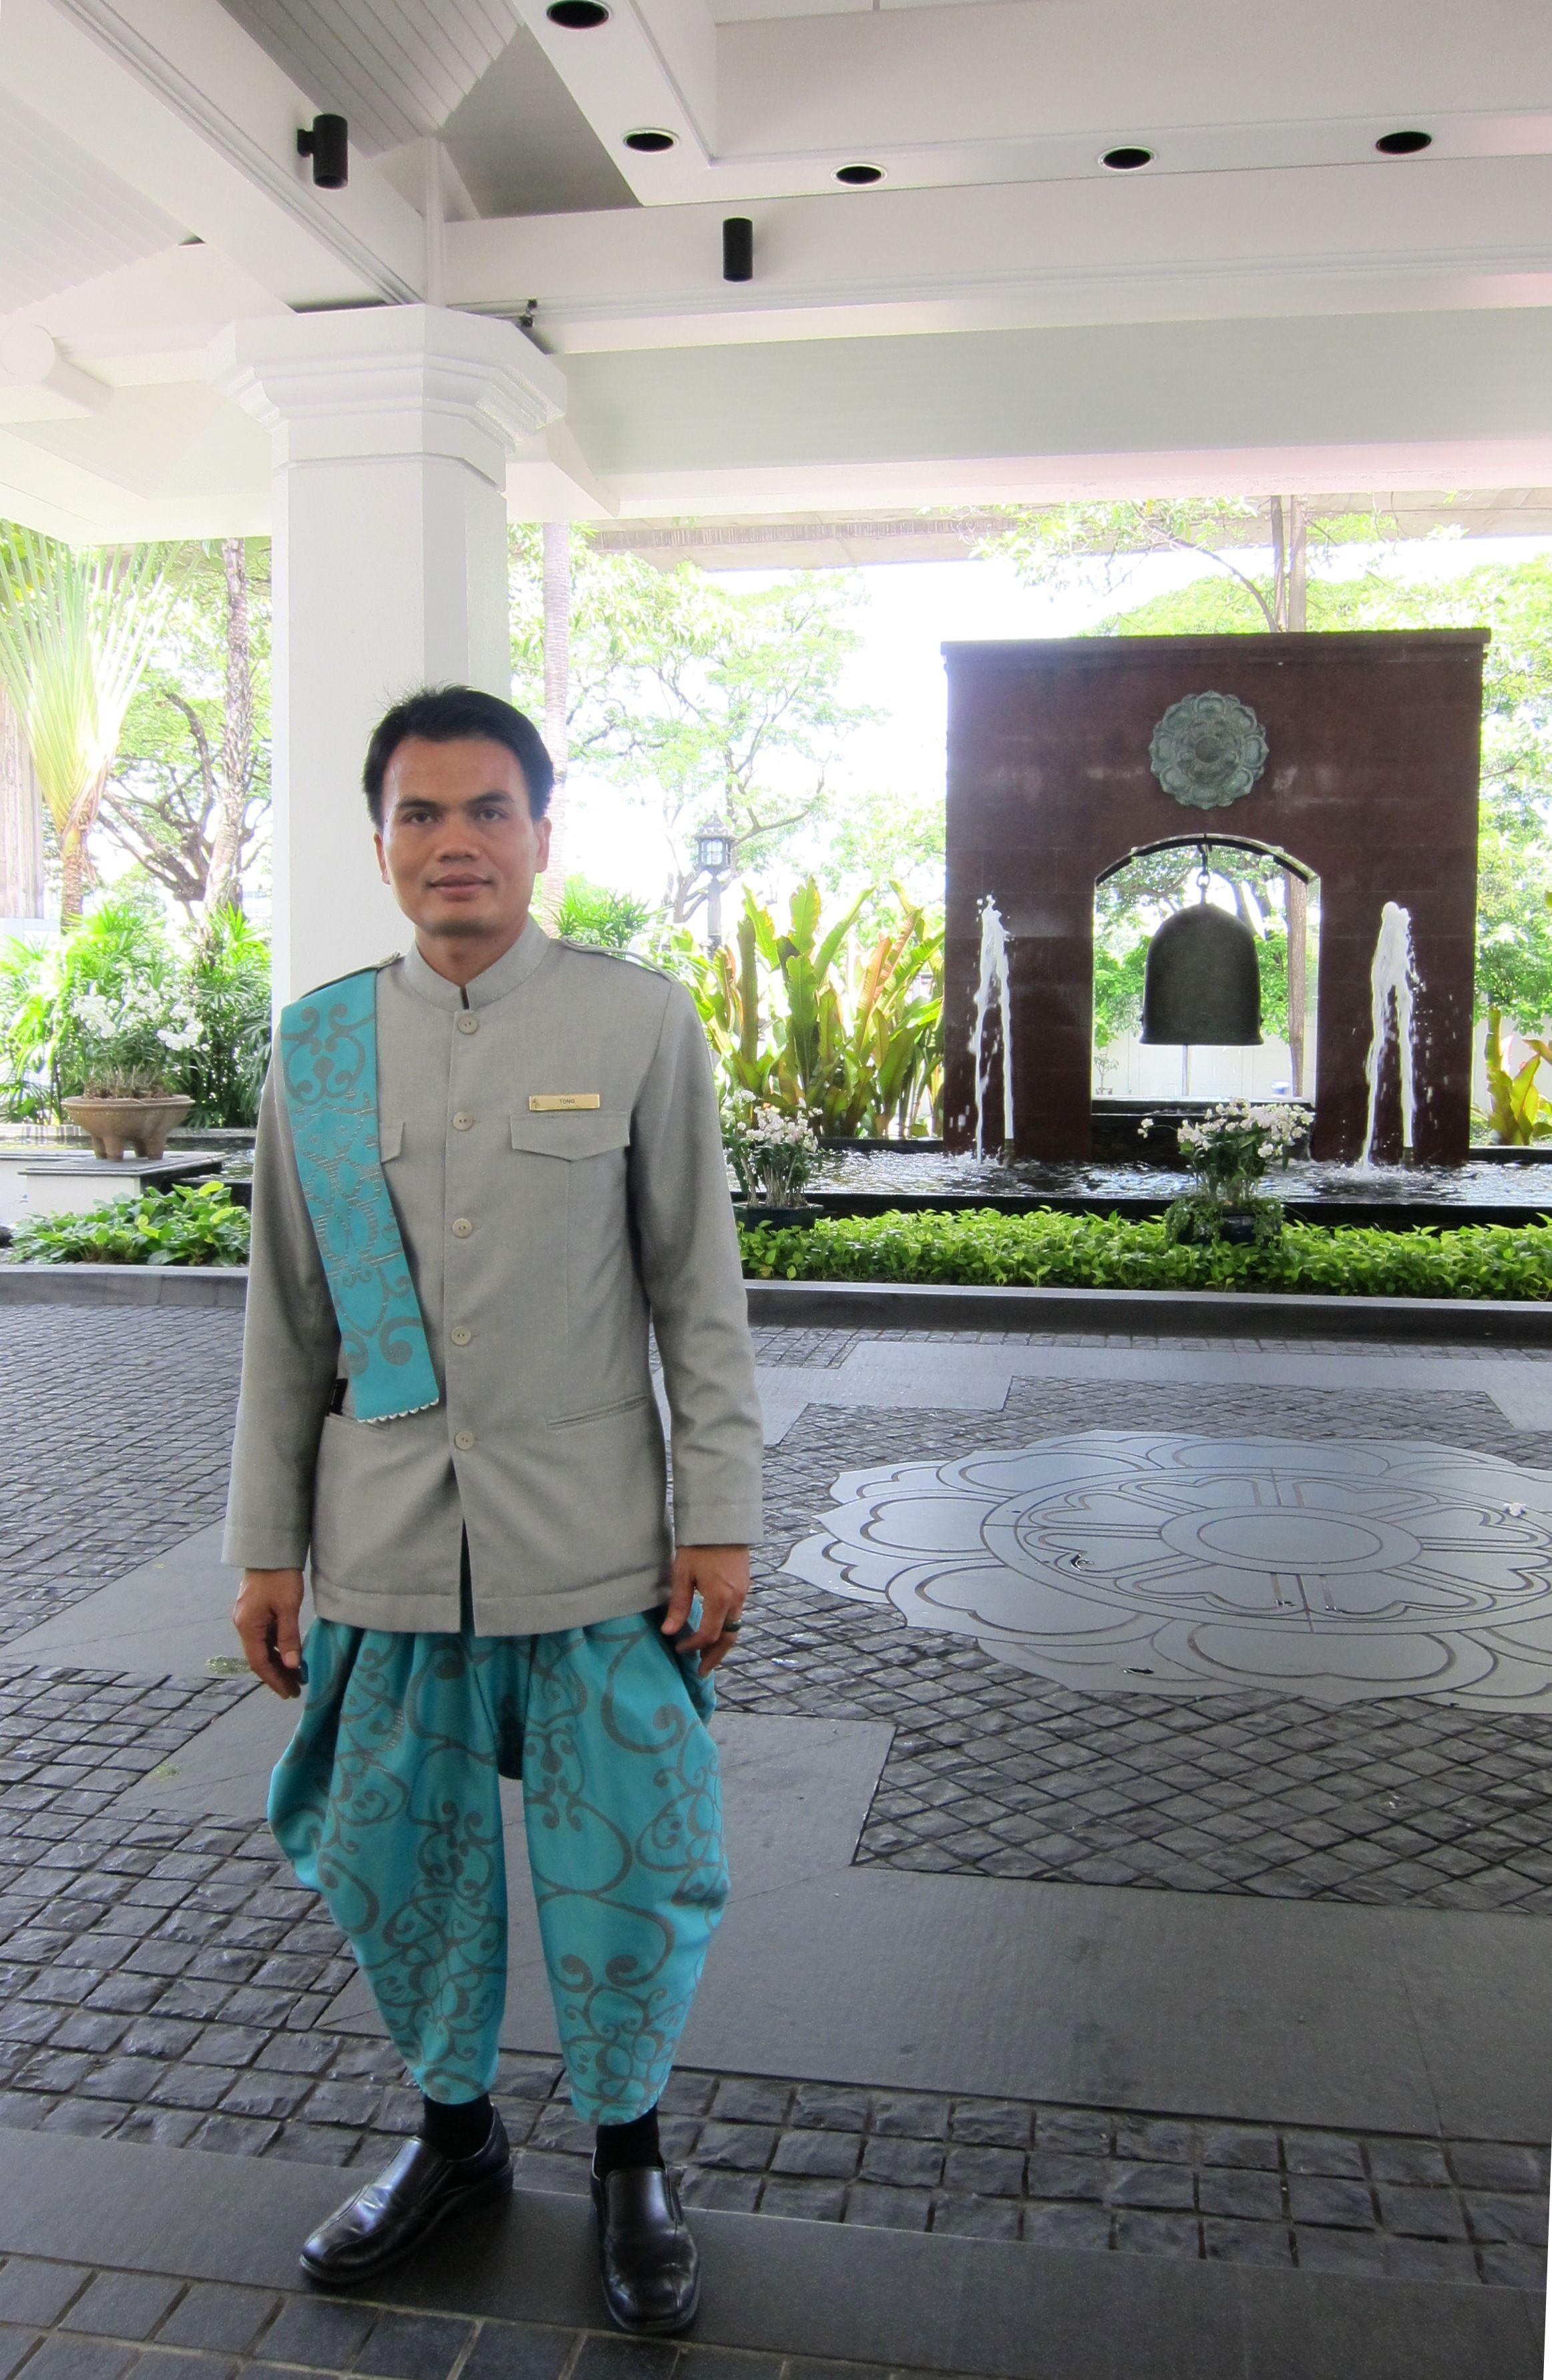 new uniform of four seasons hotel bangkok 39 s doorman with